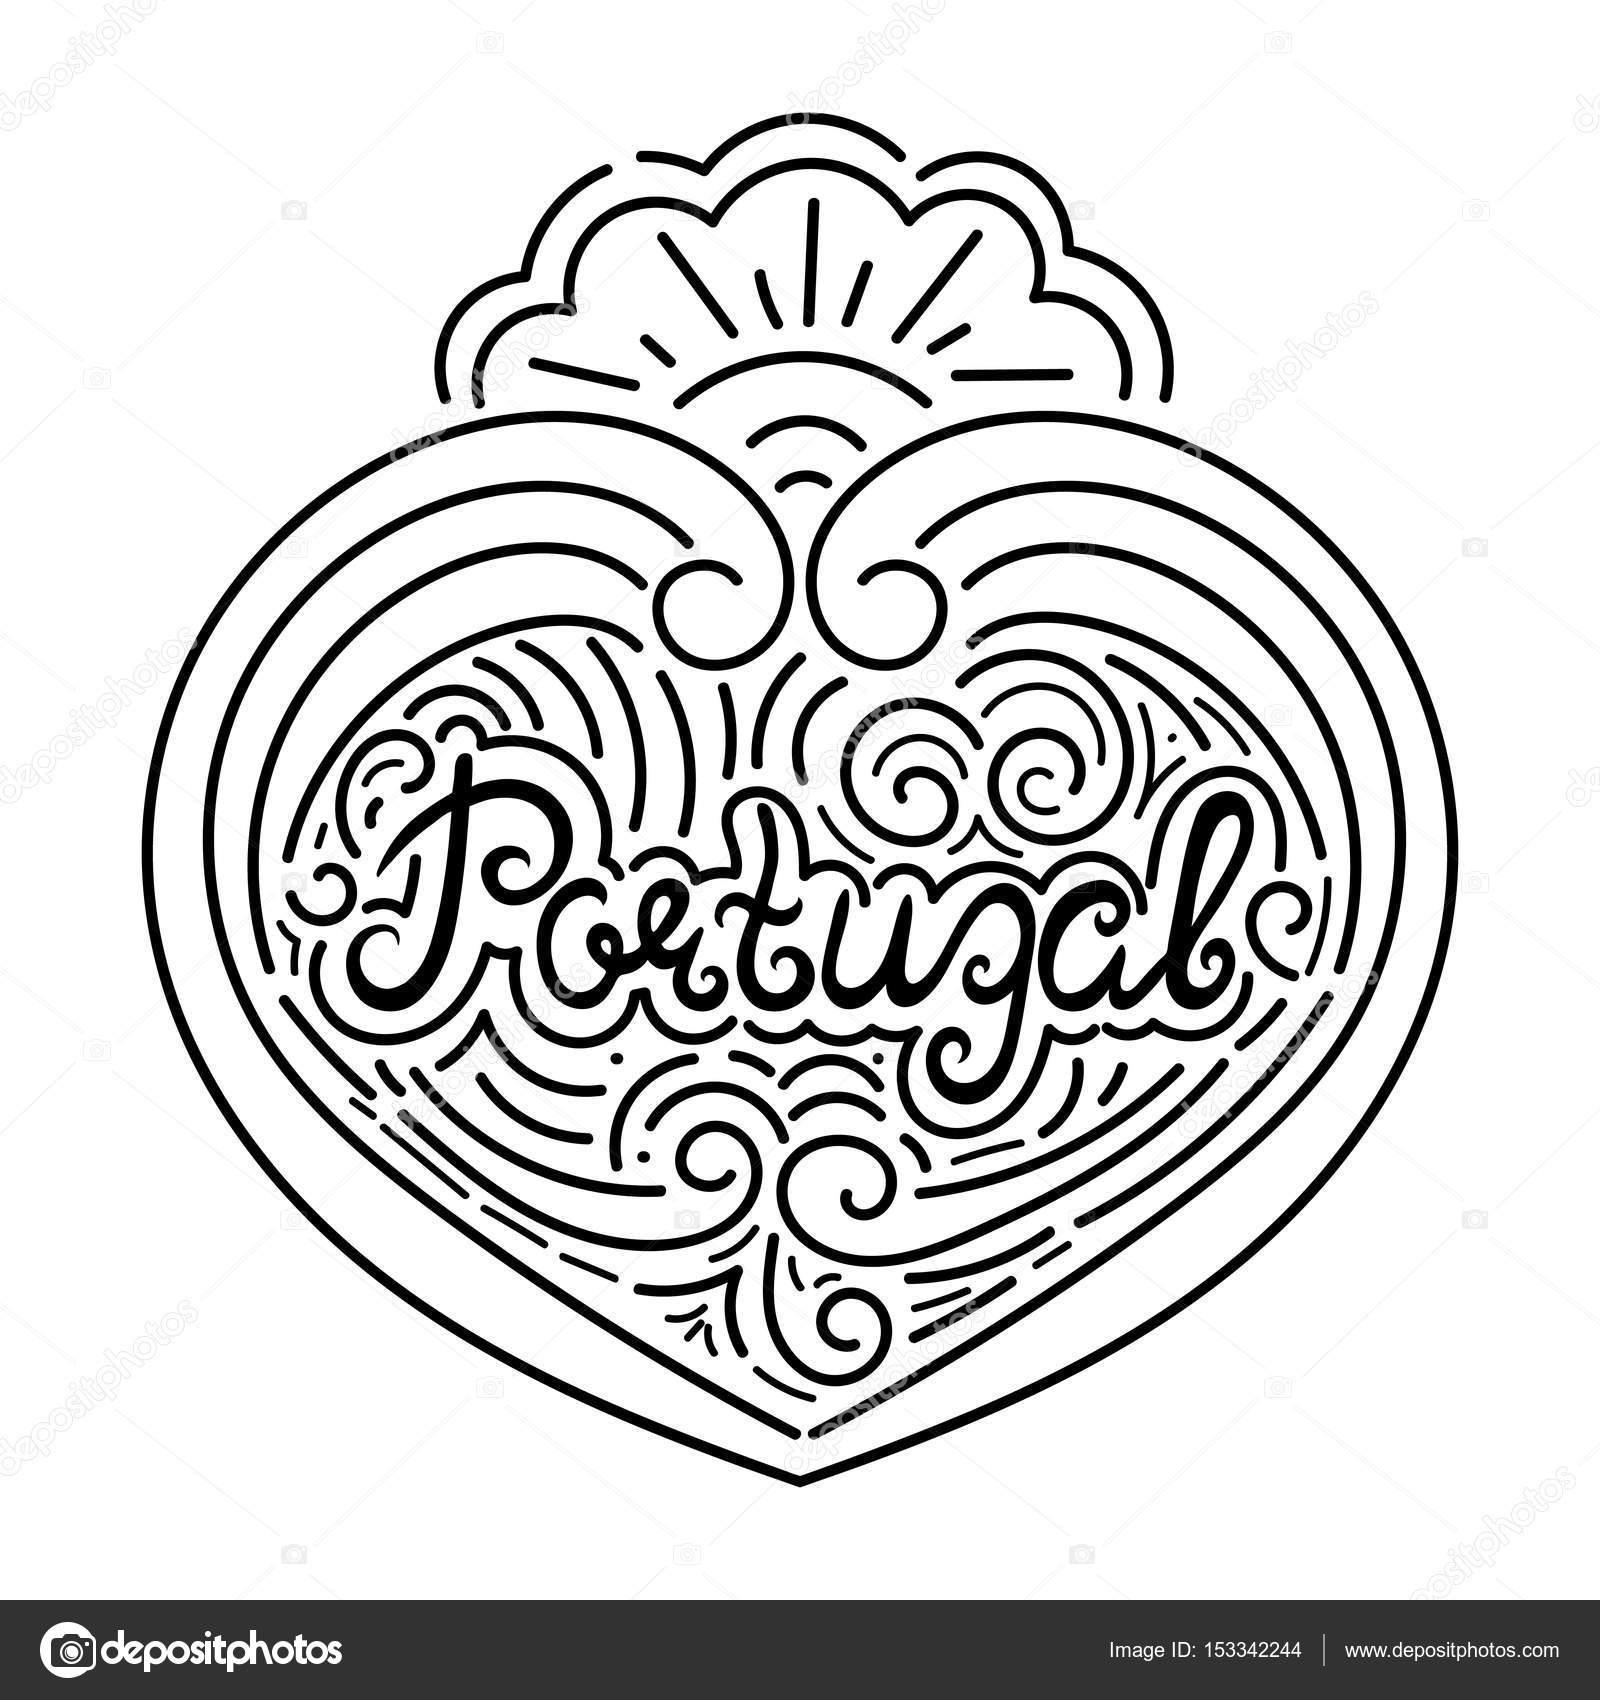 Portugal hand drawn typography black white illustration — Stock